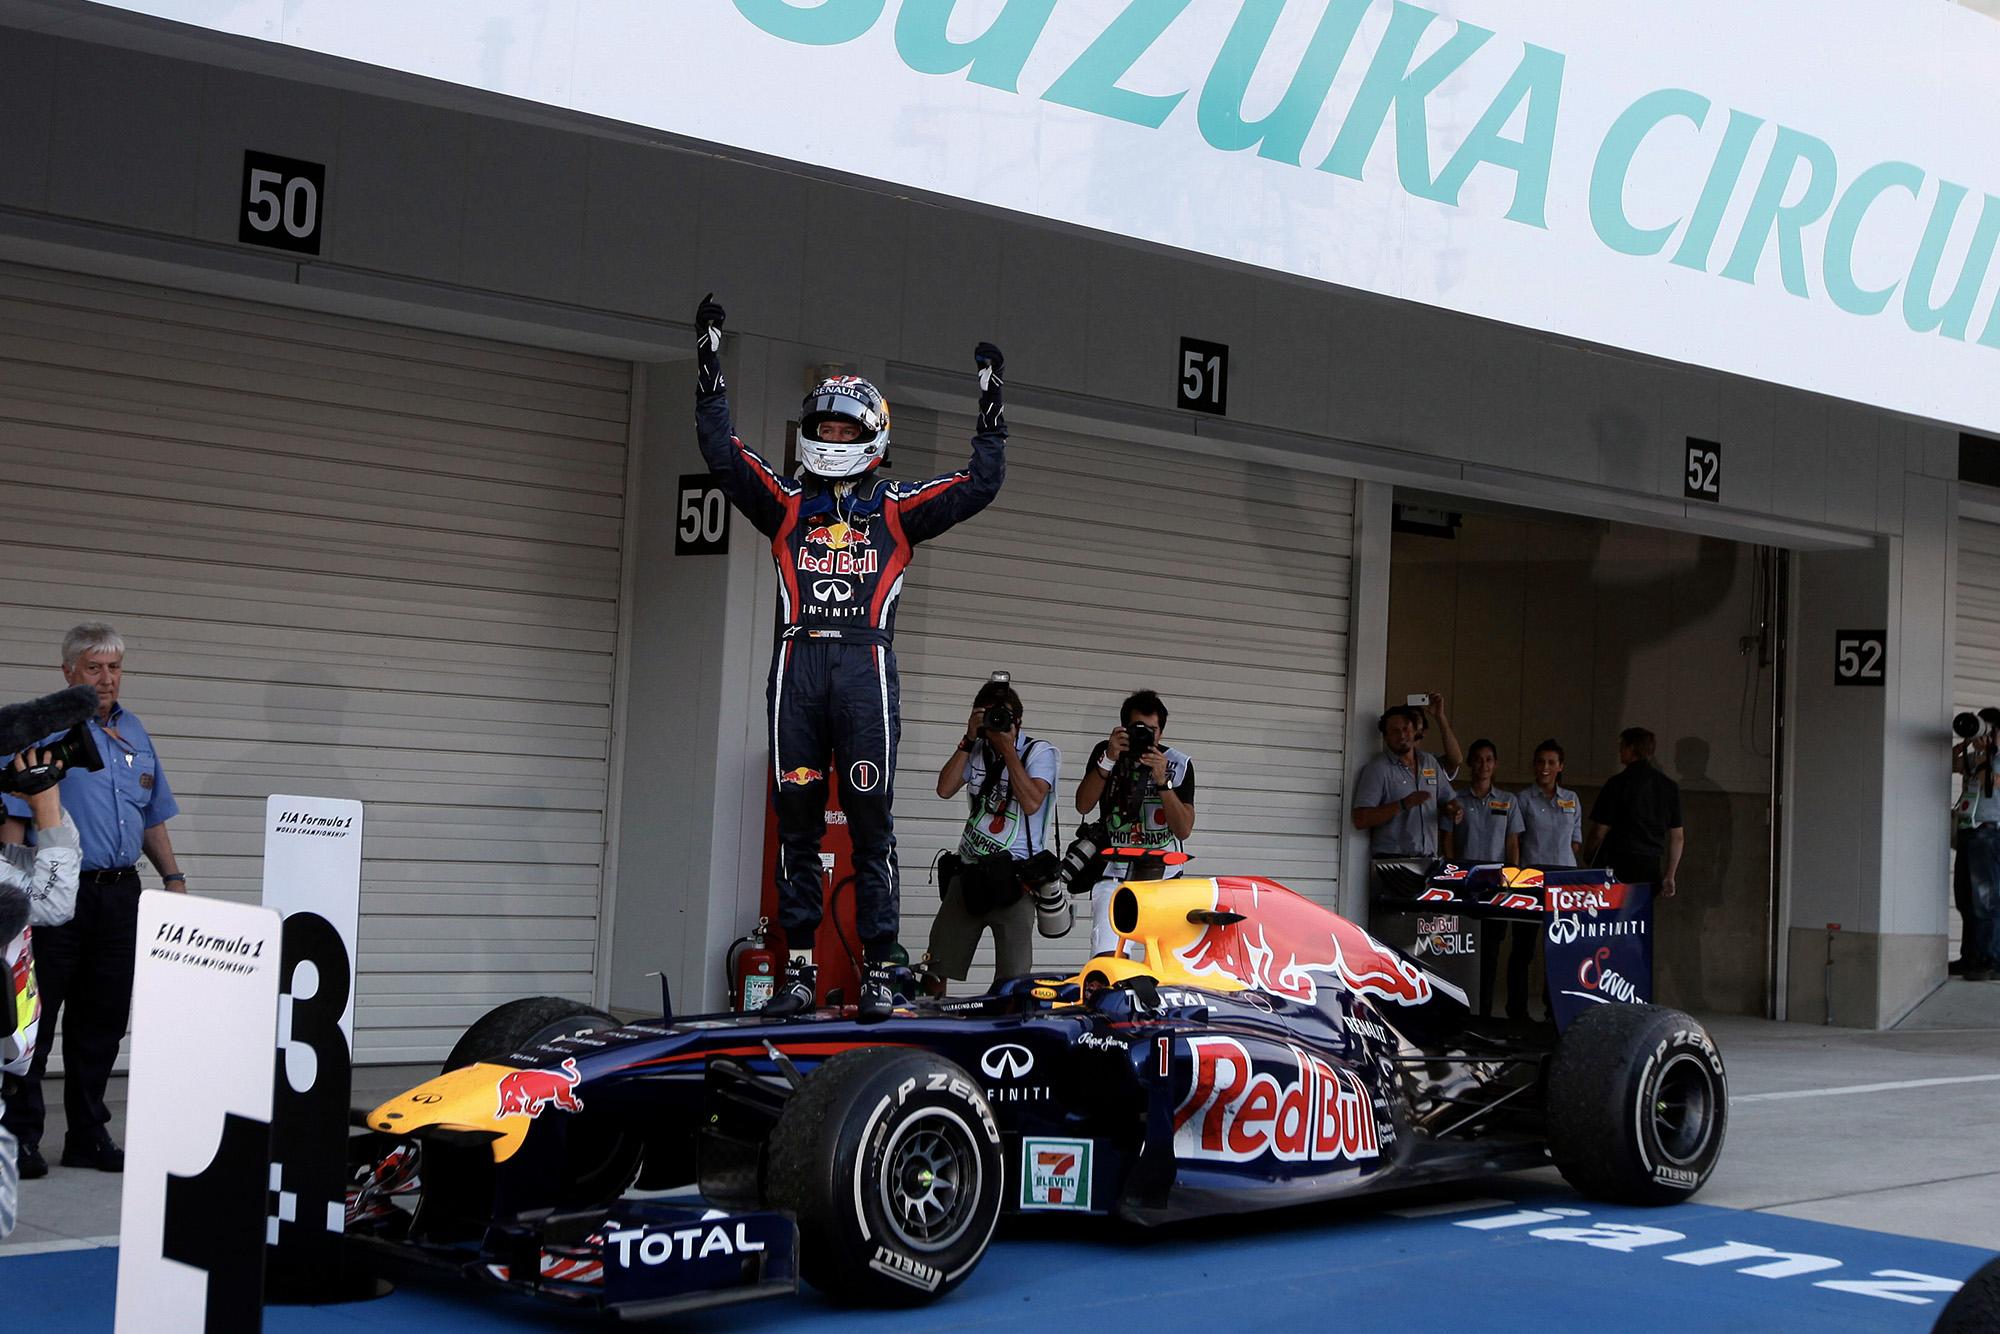 Sebastian Vettel celebrates winning the 2011 F1 championship at the Japanese Grand Prix